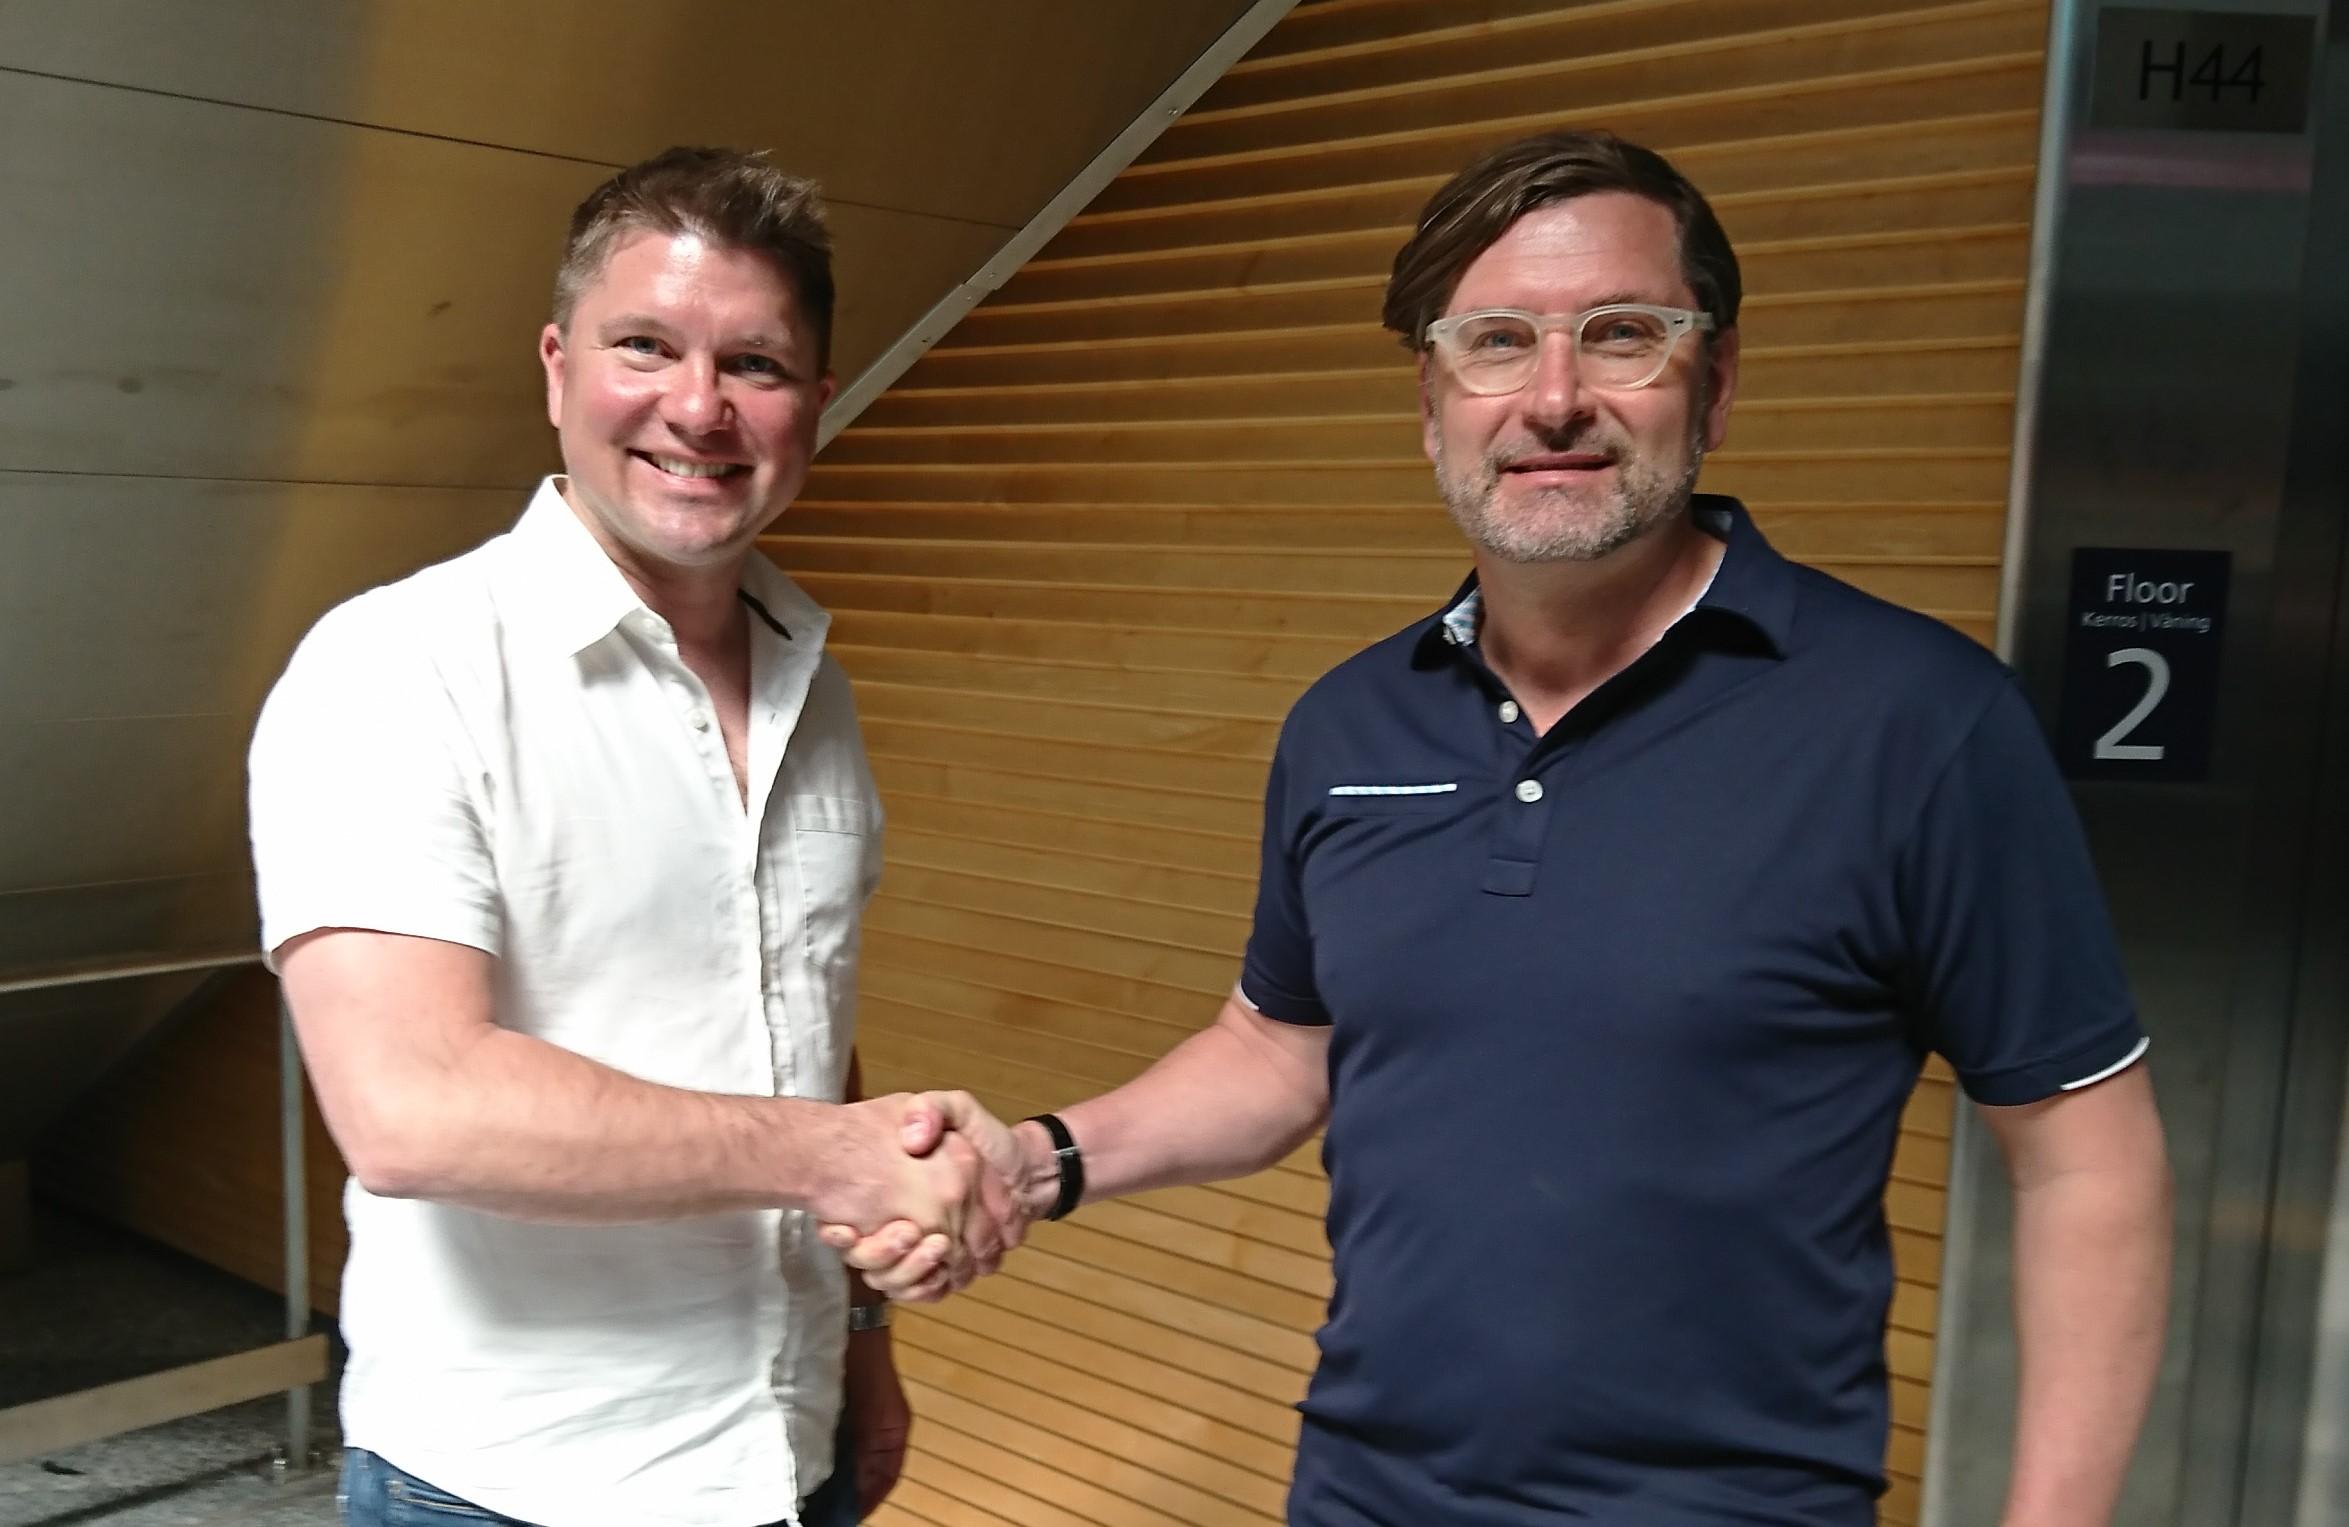 CEO-Maximilian_LeRoux_shakes_hands_with_new_Director_EMEA+Asia_Hannu_Elopuro2